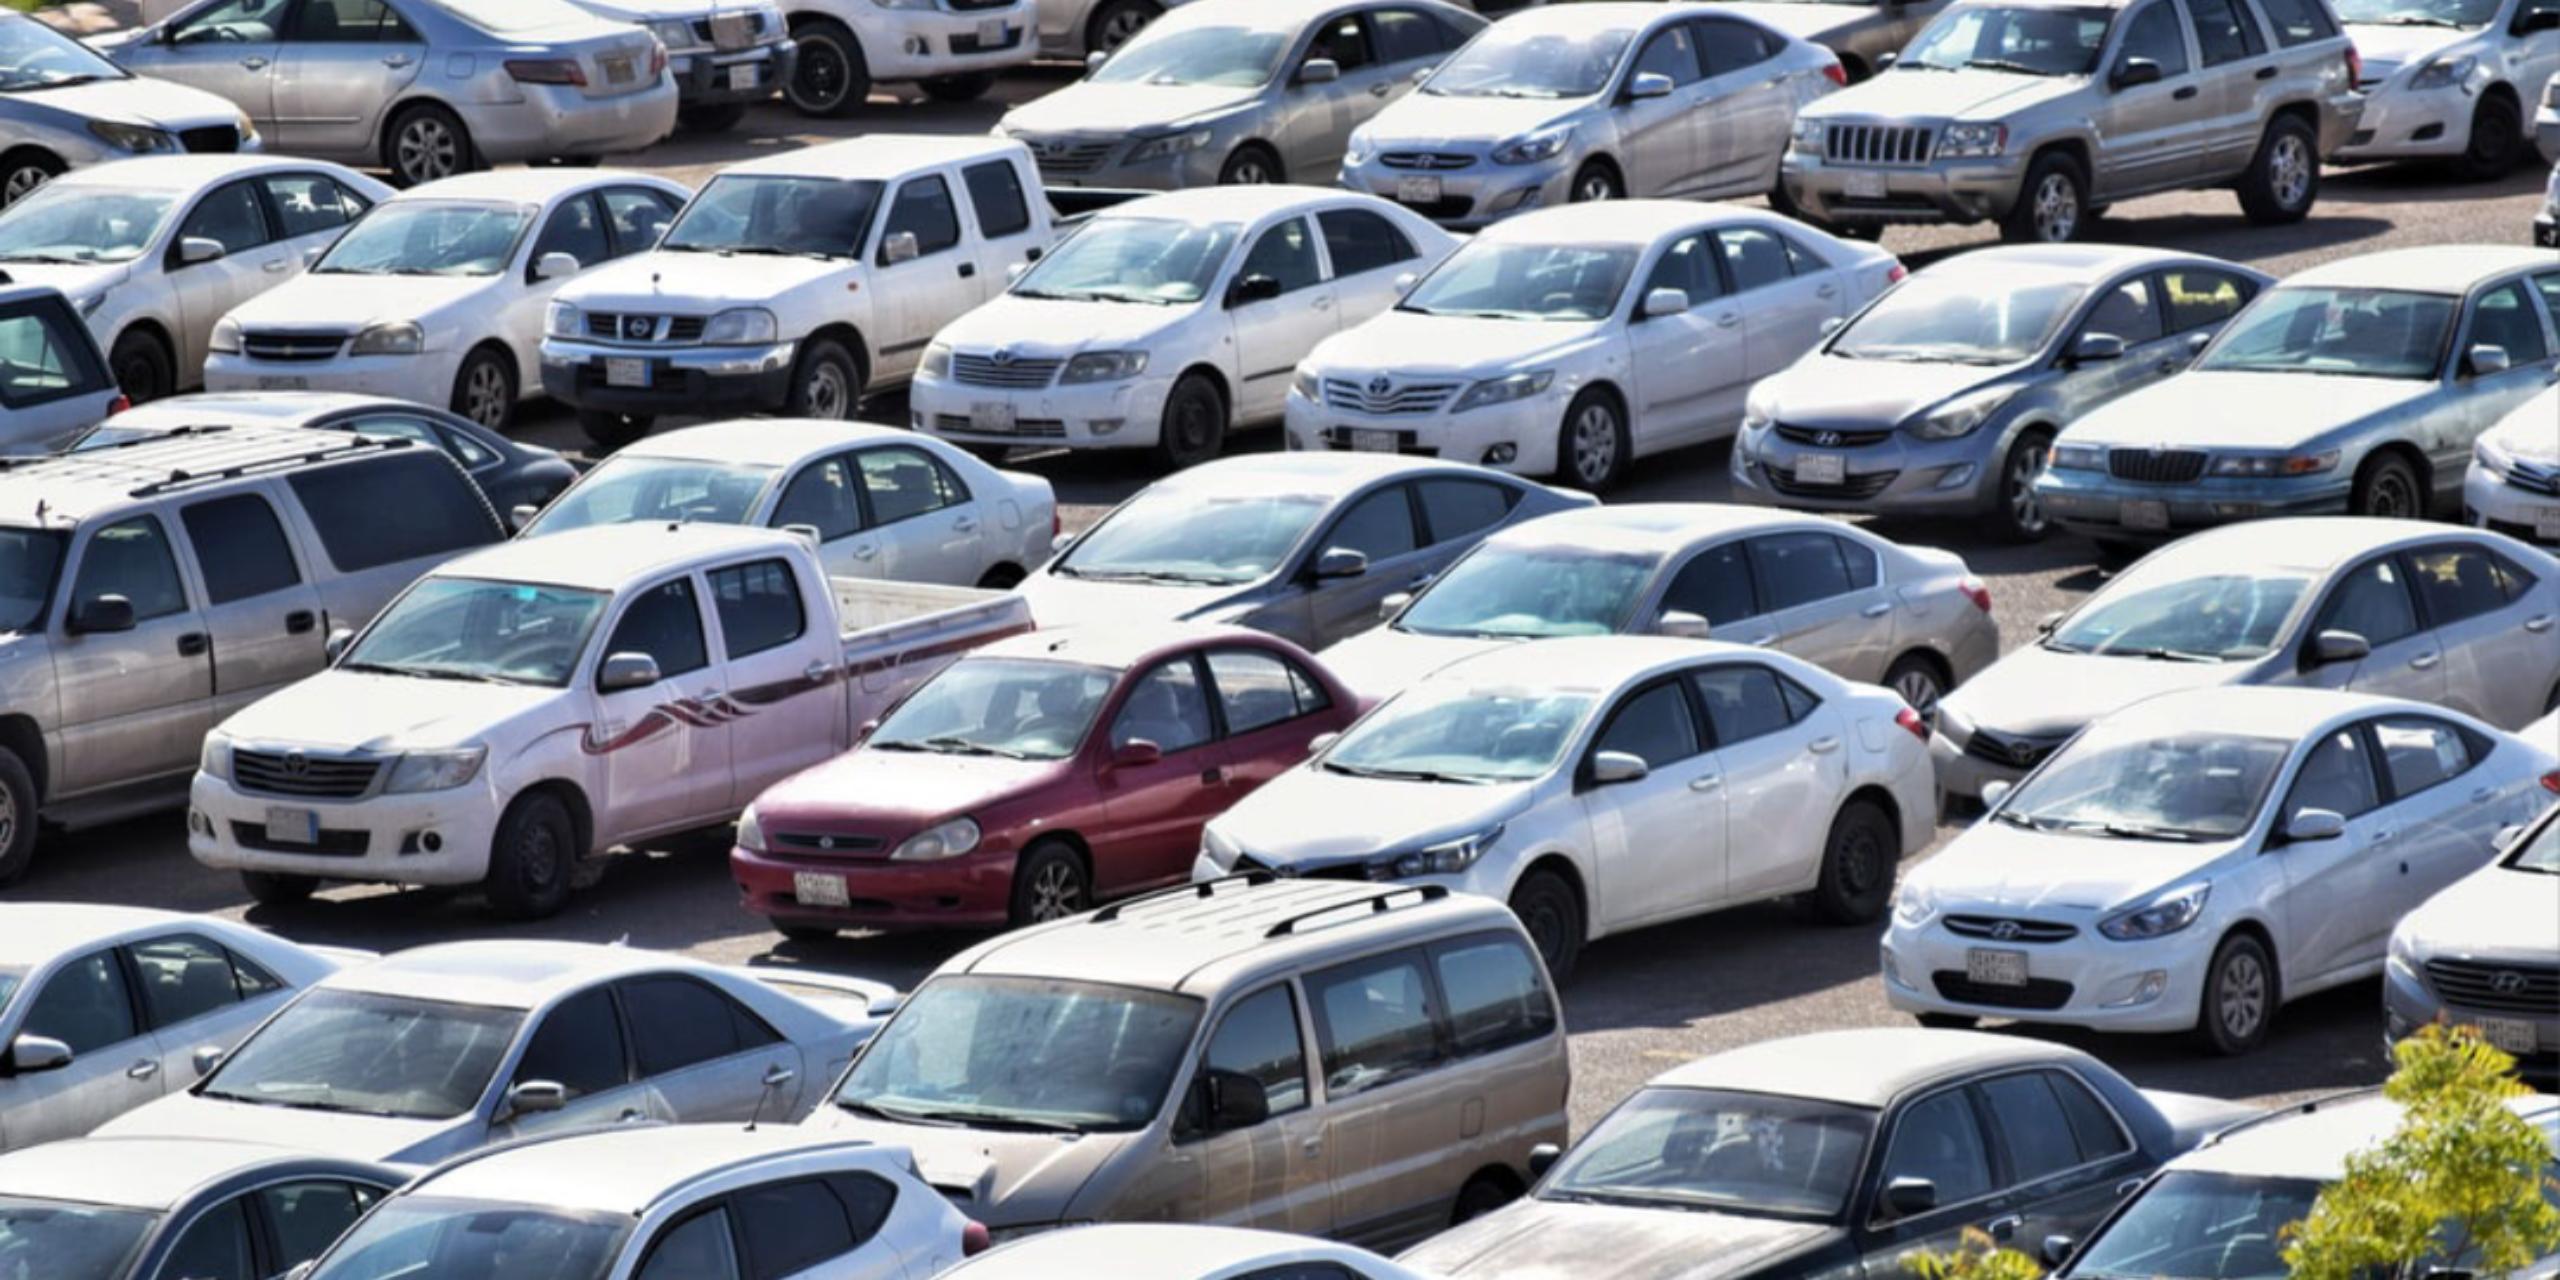 Wantage car parks